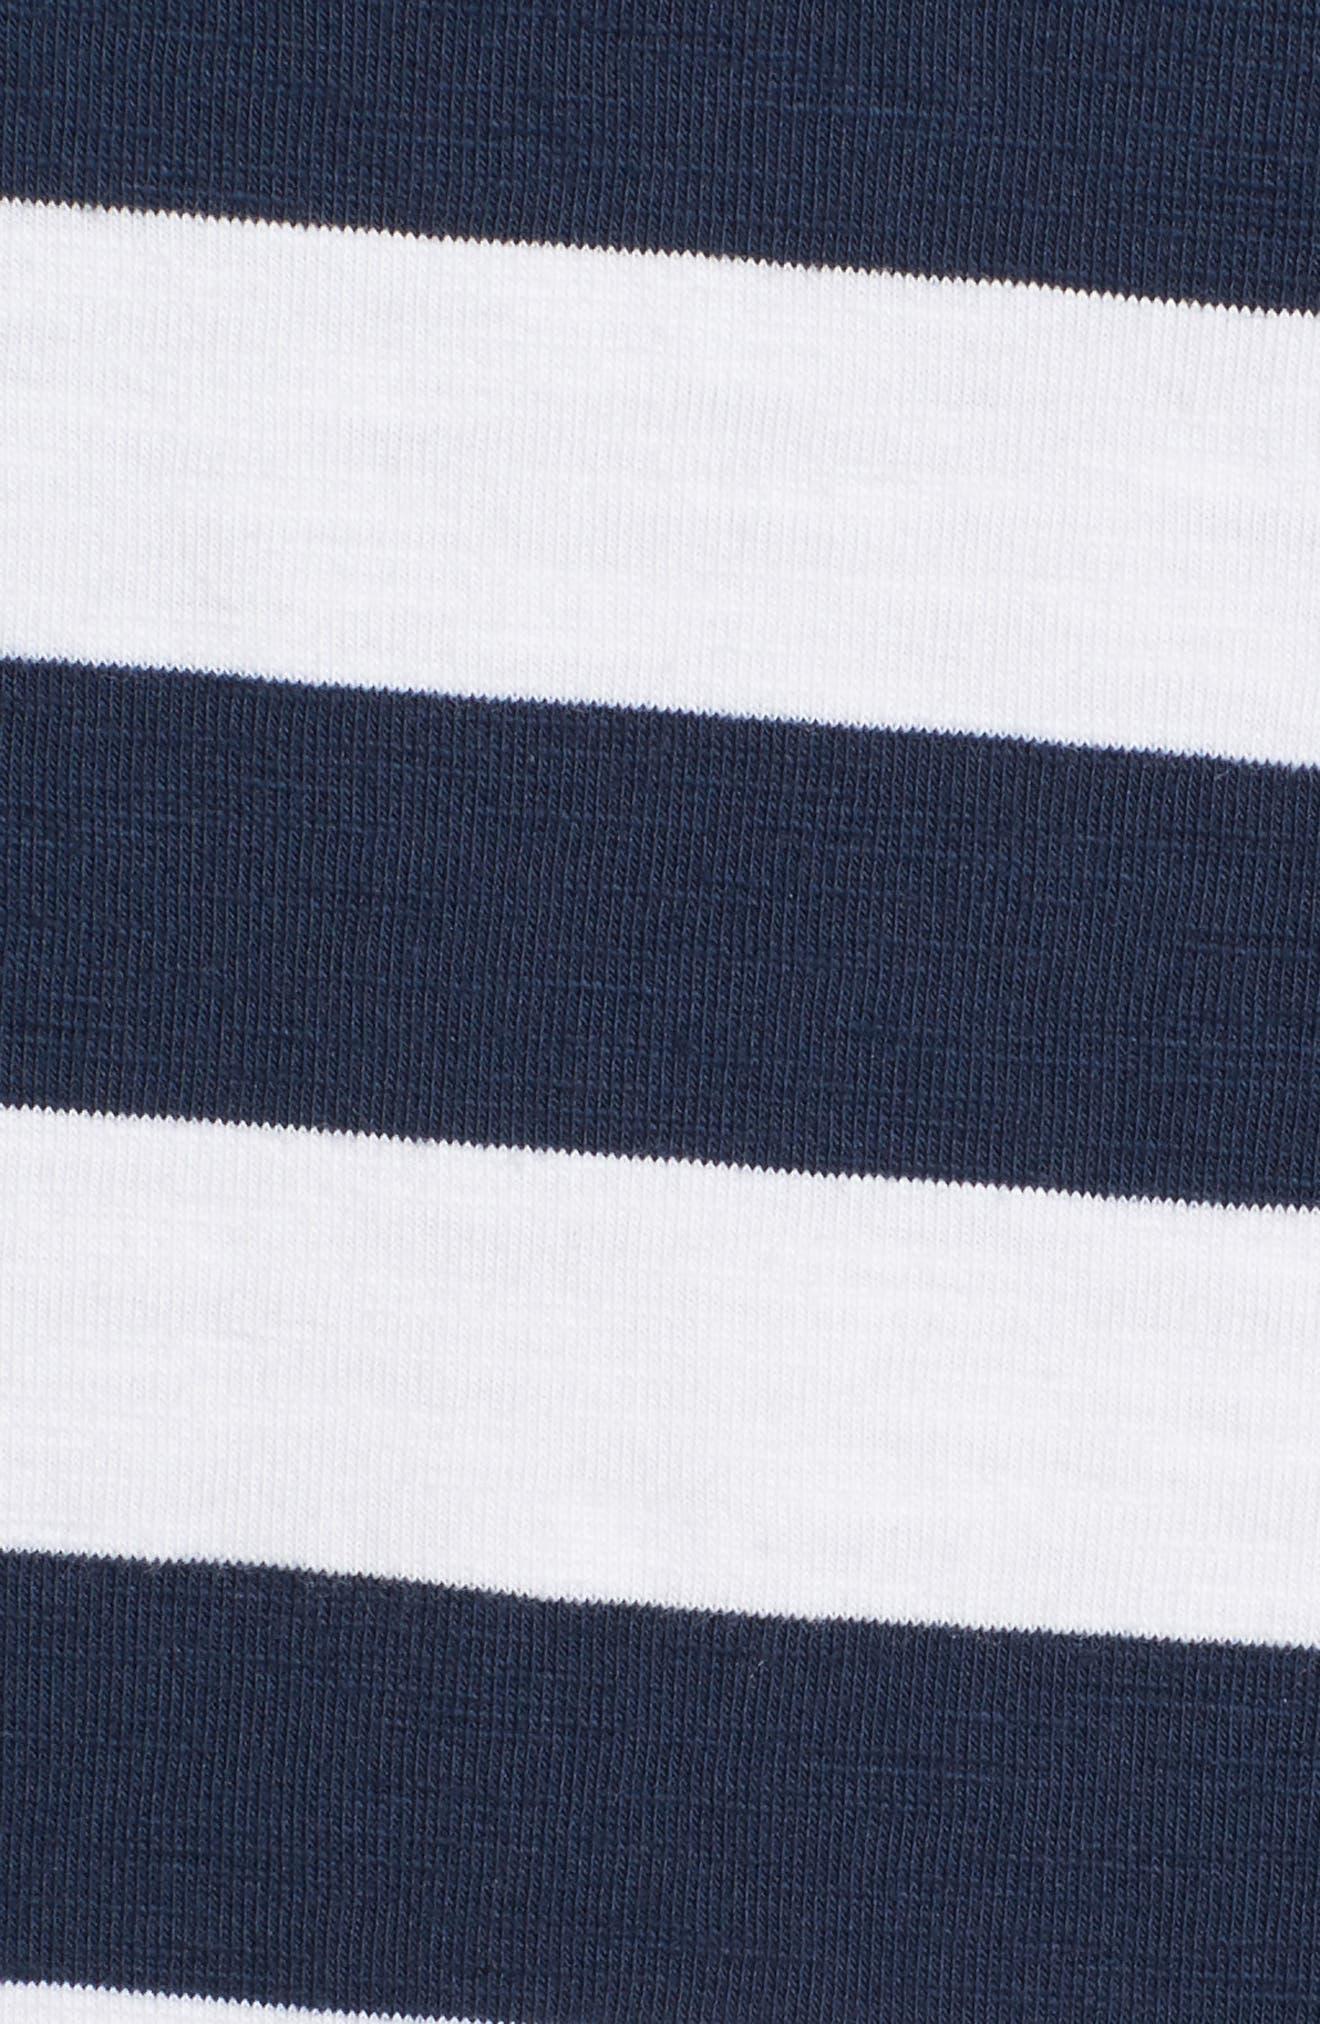 Stripe Right Lace-Up Stretch Cotton Dress,                             Alternate thumbnail 5, color,                             OCEAN DEEP